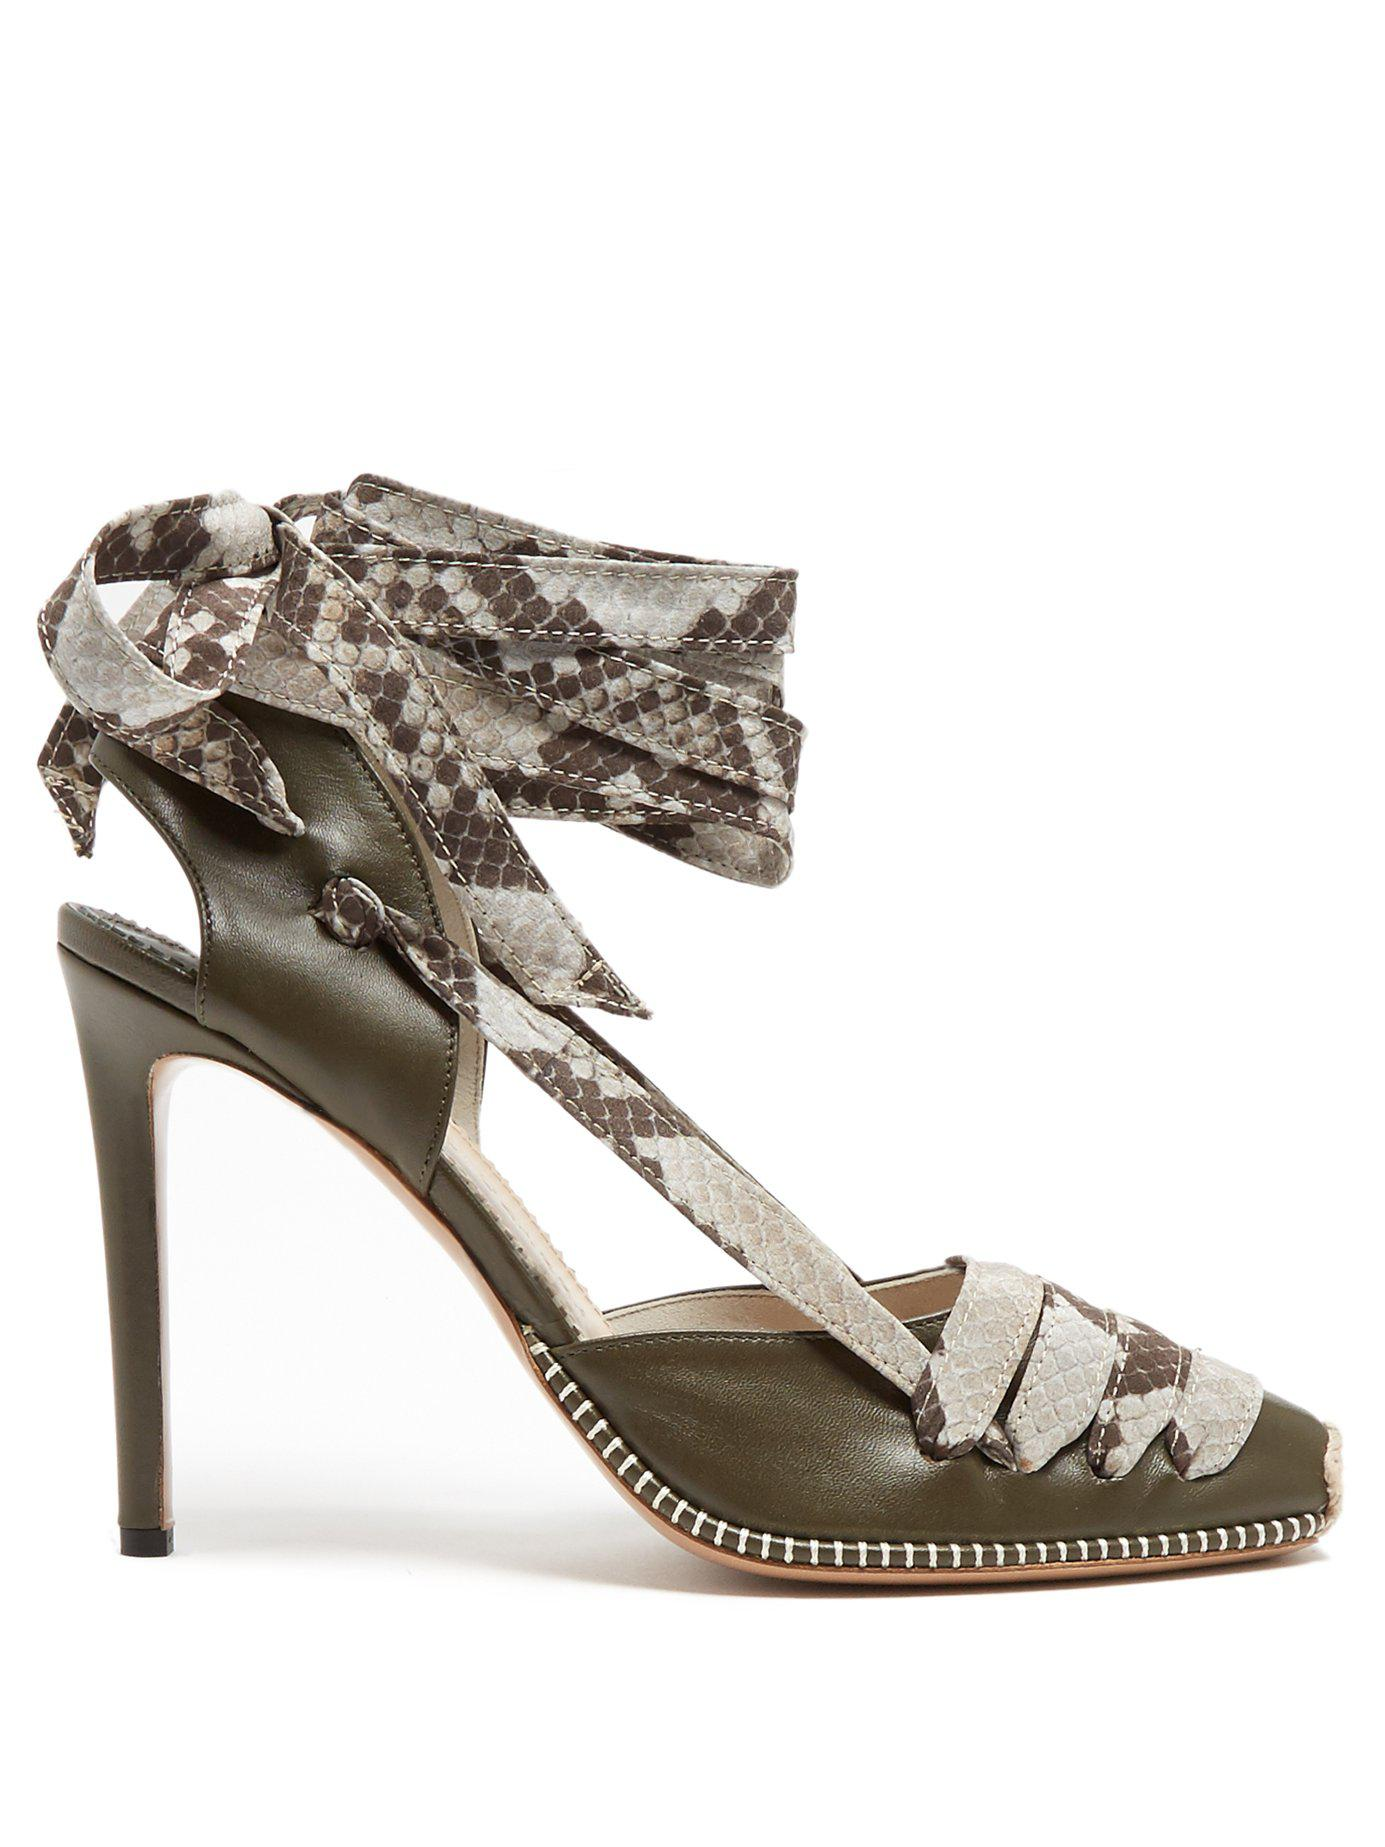 Altuzarra Python-print ribbon d'Orsay leather pumps Discount Popular geqIY20Y